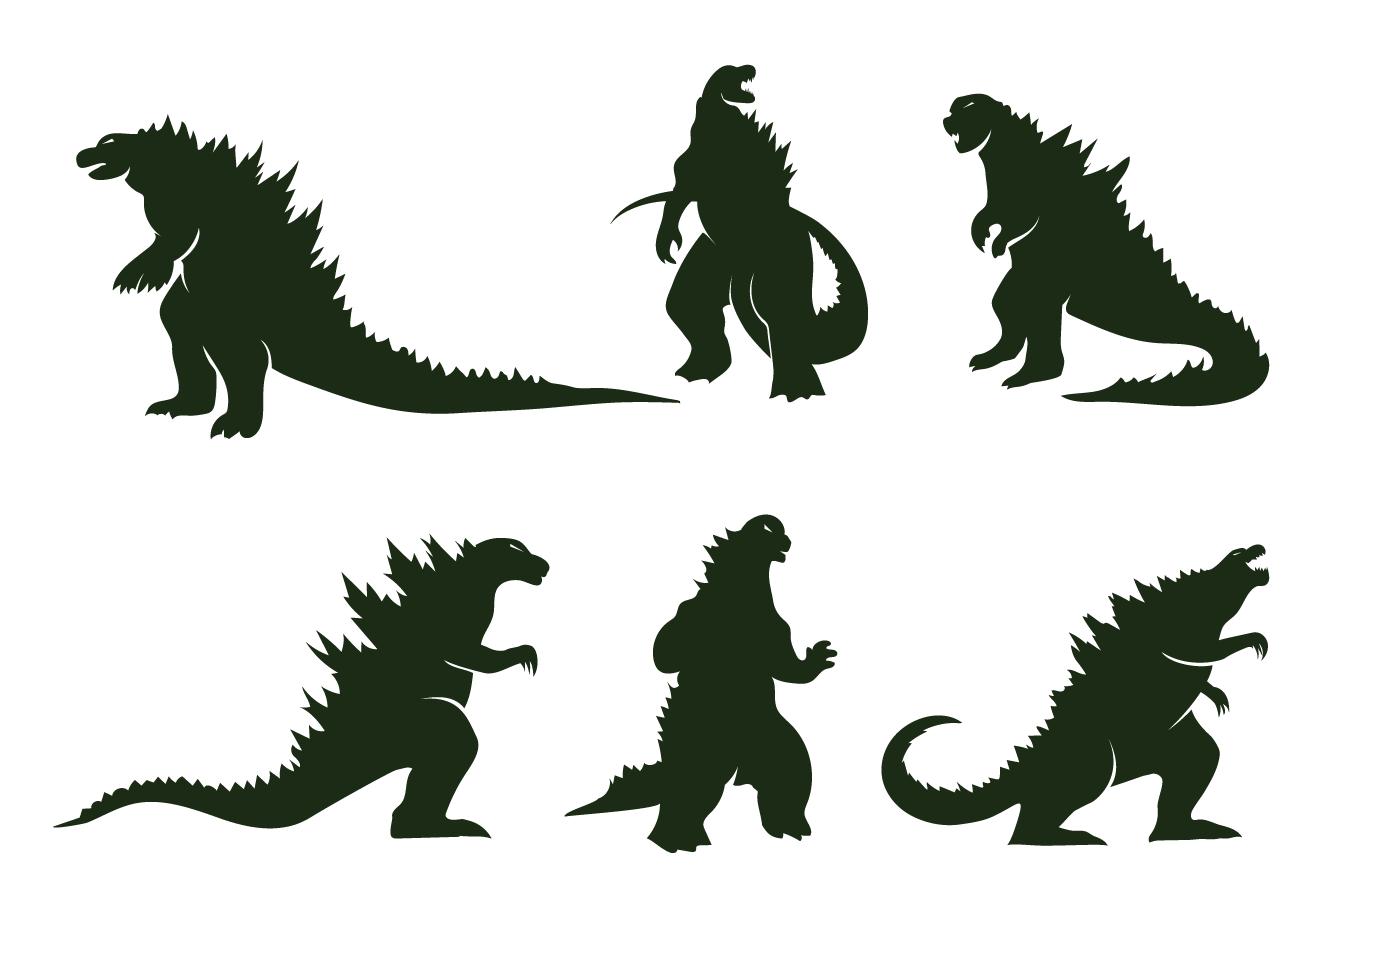 Free Godzilla Vector - Download Free Vector Art, Stock ...